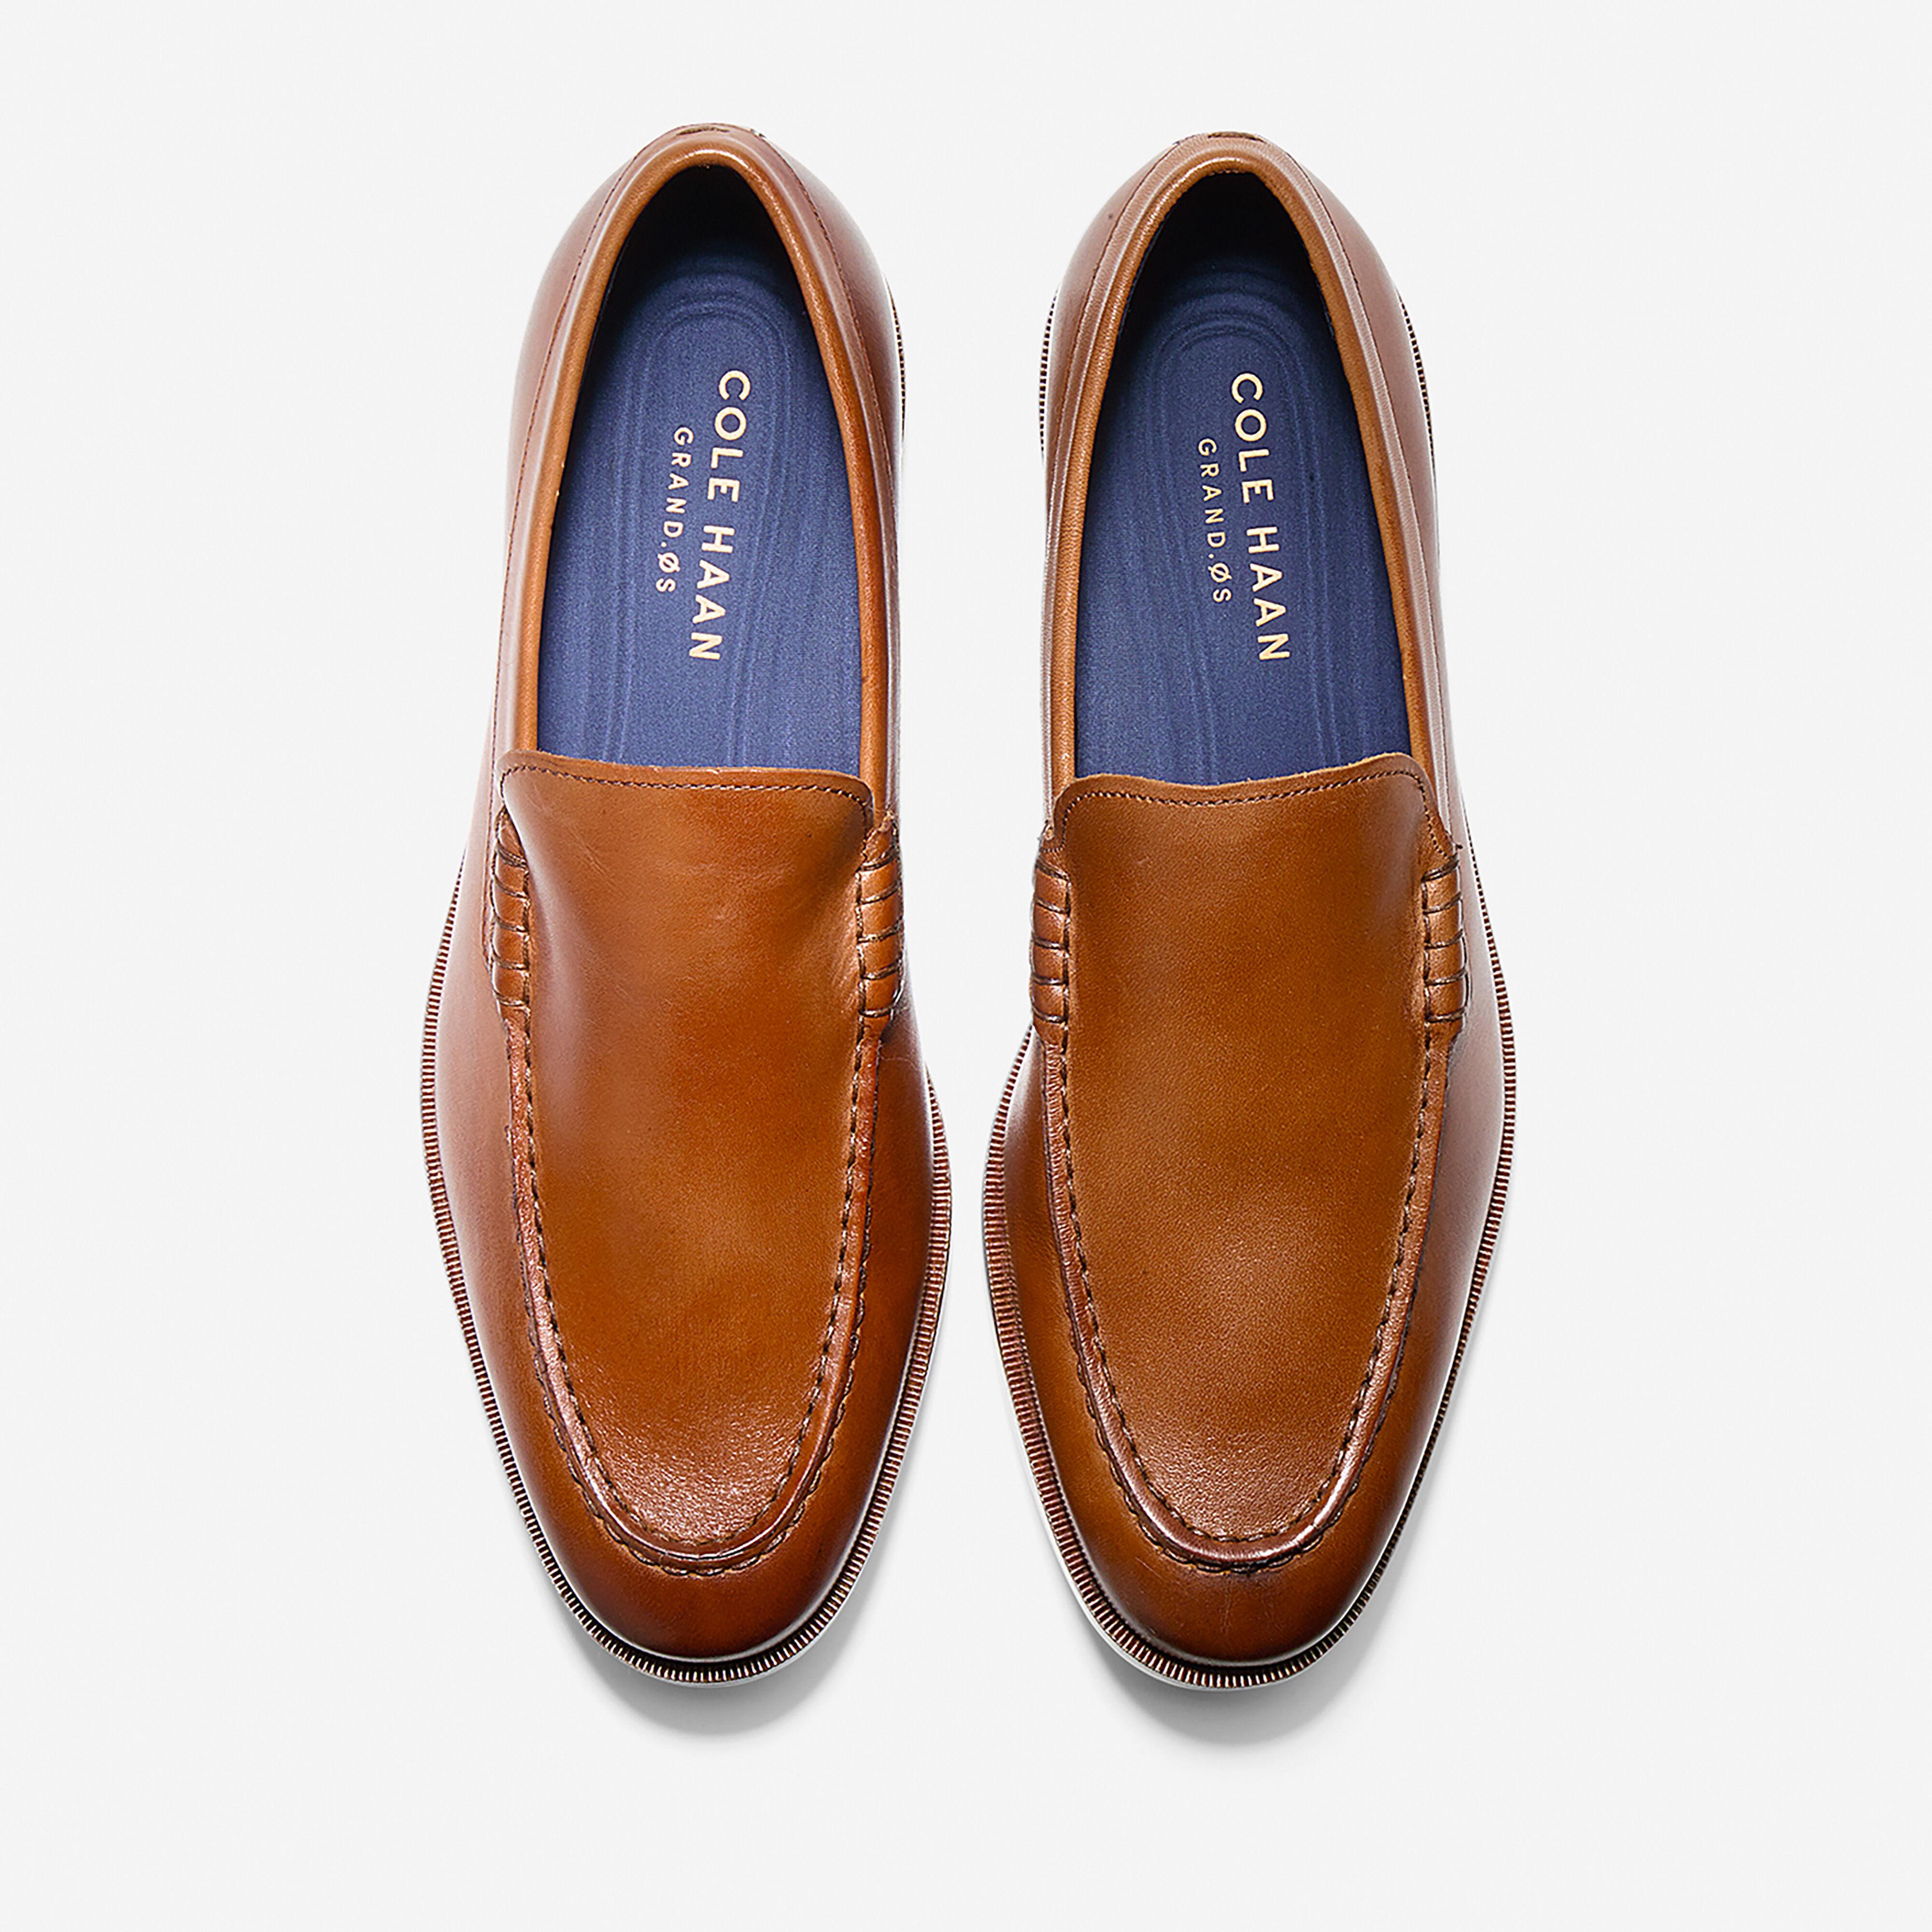 Men's Hamilton Grand Venetian Loafer in